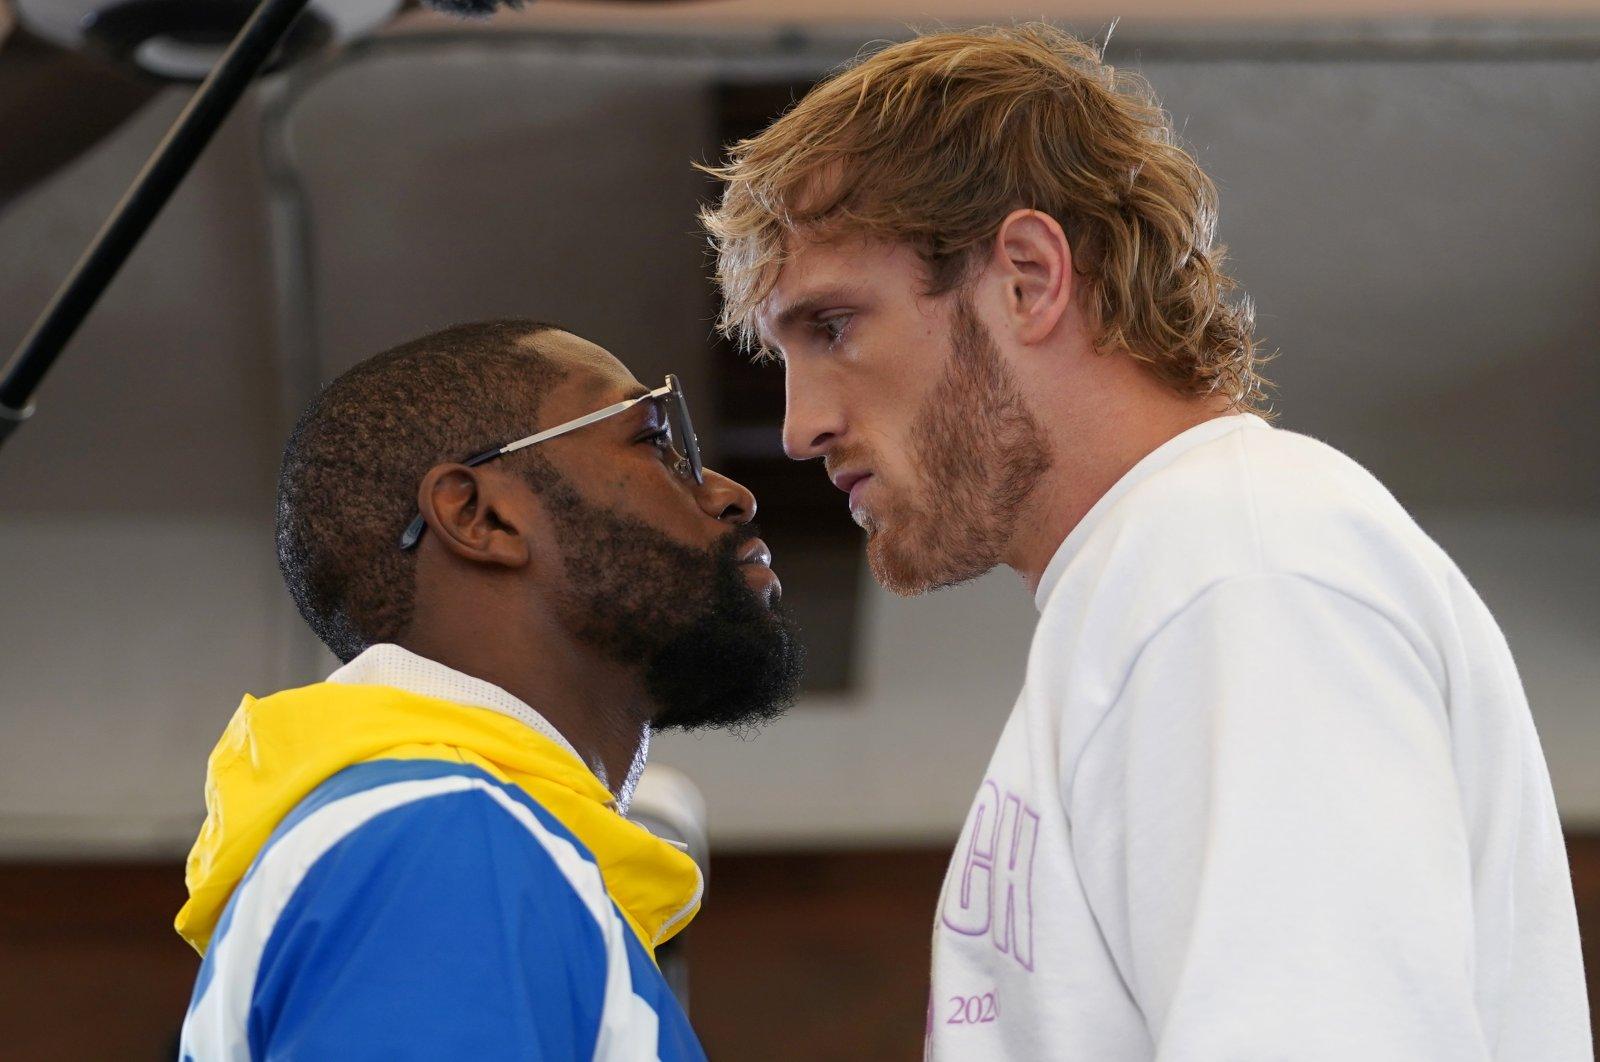 Former boxing world champion Floyd Mayweather (L) and YouTube star Logan Paul face off at Villa Casa Casuarina, Miami, U.S., June 3, 2021. (Reuters Photo)